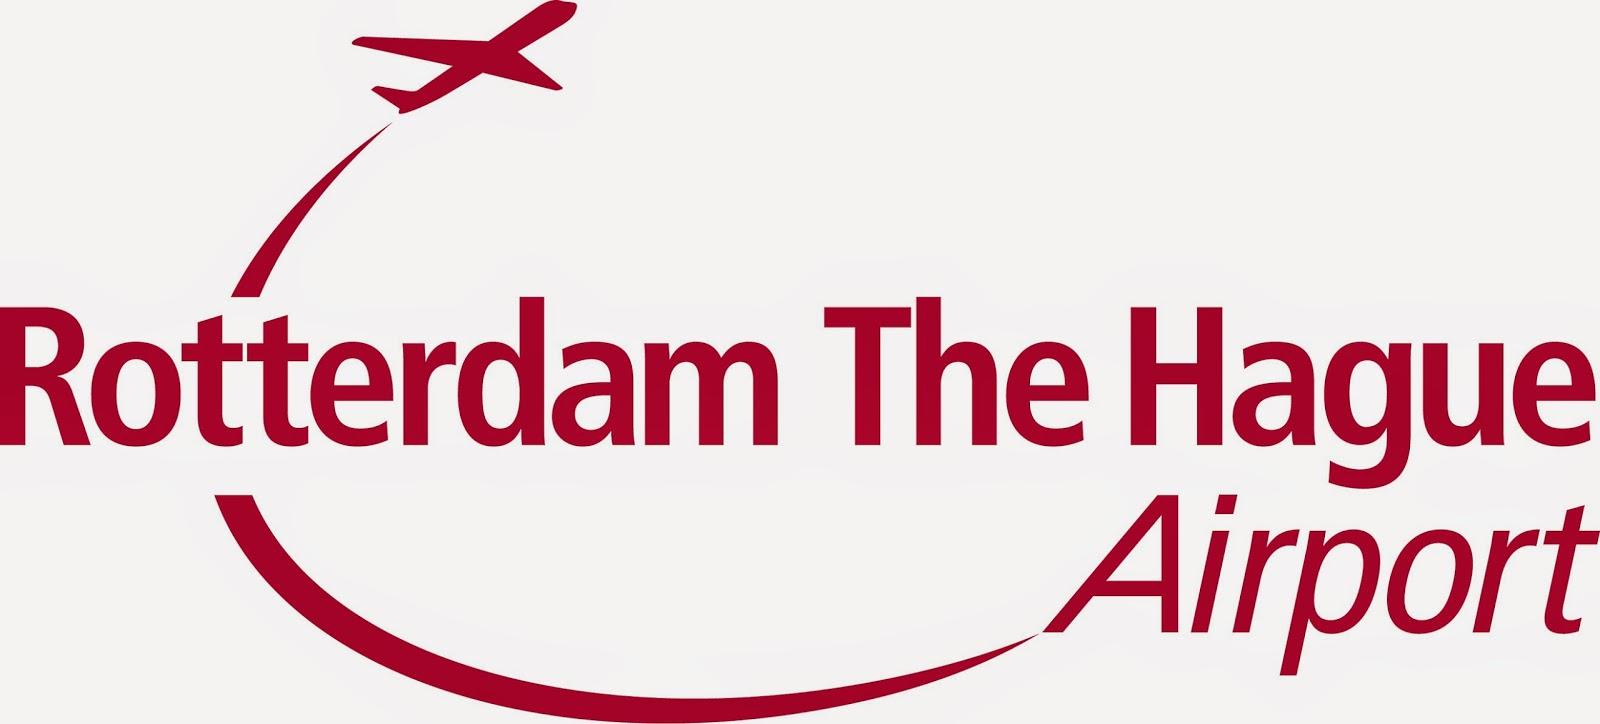 The Flying Dutchboy: British Airways vliegt vanaf Rotterdam op Londen ...: theflyingdutchboy.blogspot.com/2014/04/british-airways-vliegt-vanaf...